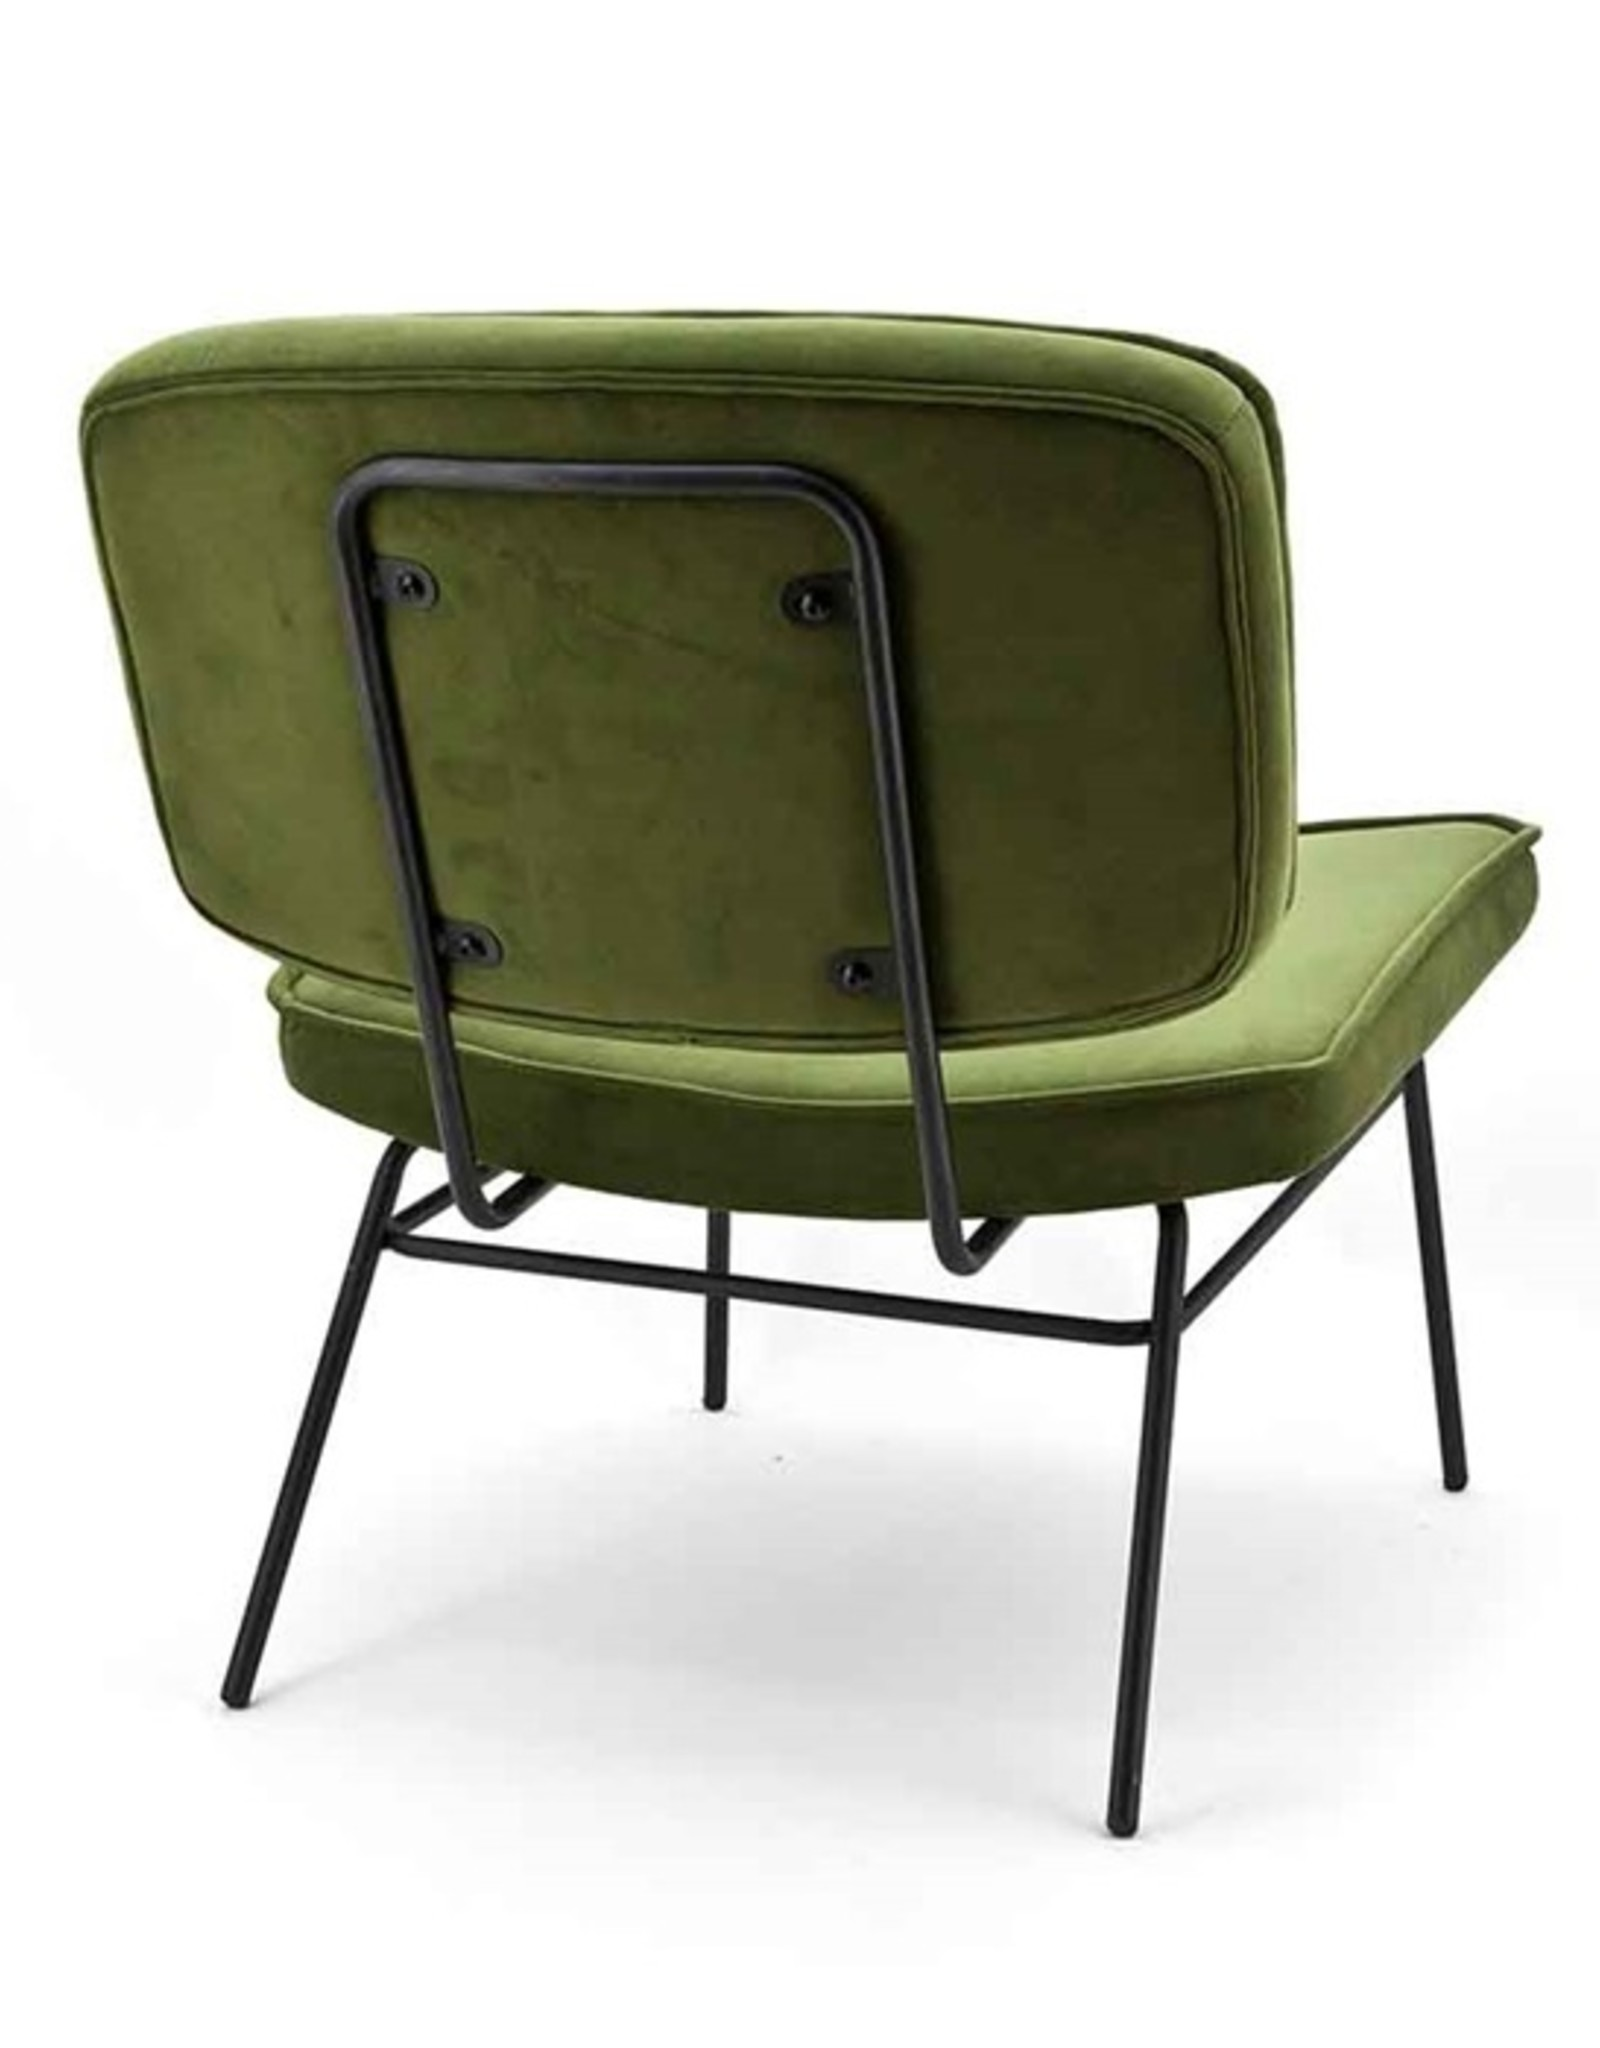 By-Boo Lounge chair Lana - Green